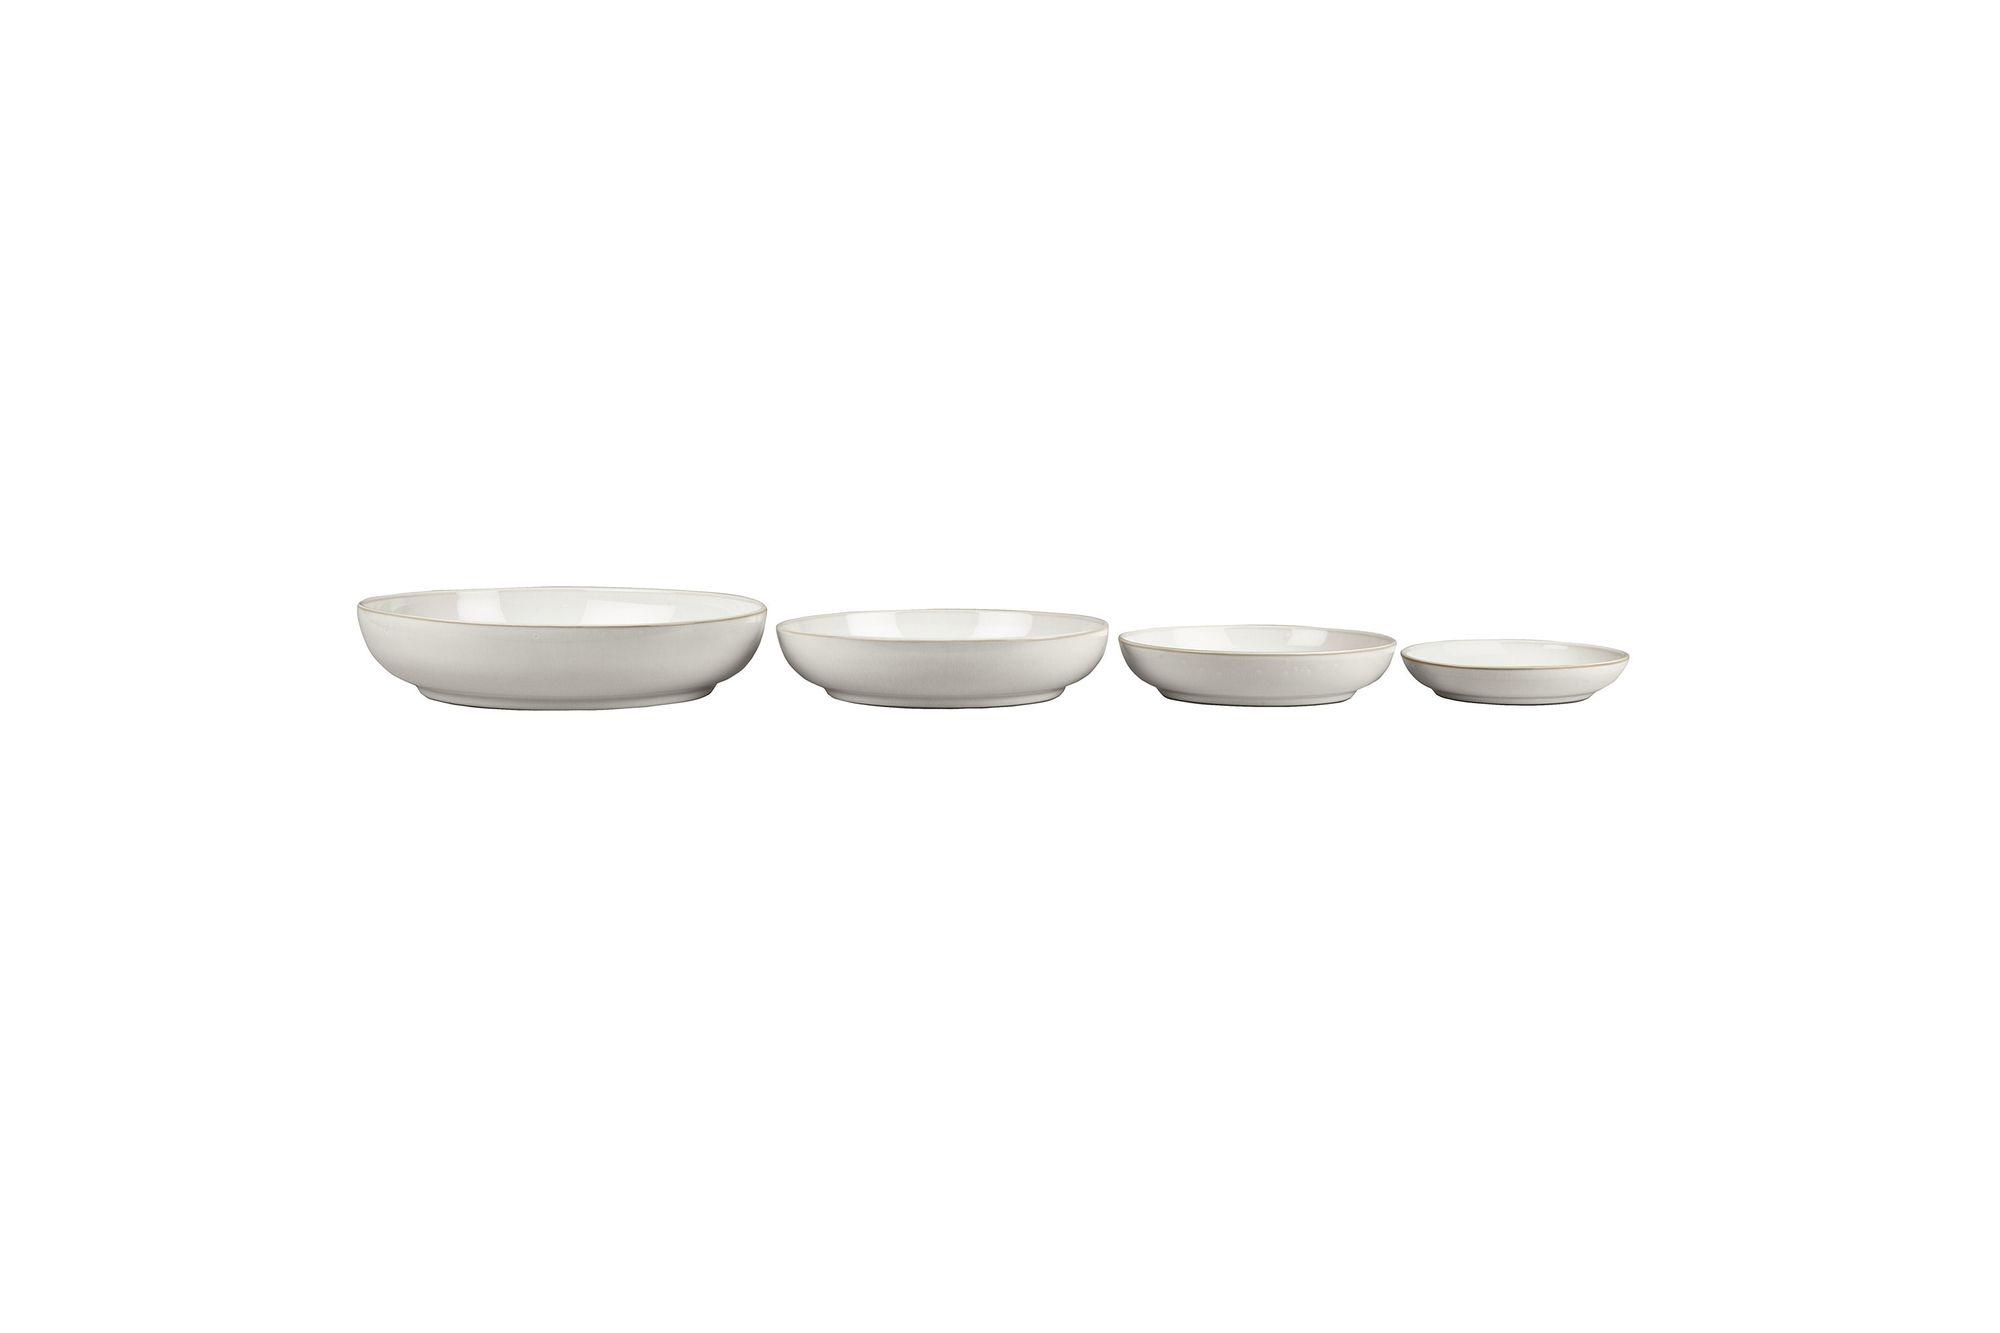 Denby Natural Canvas 4 Piece Nesting Bowl Set thumb 2